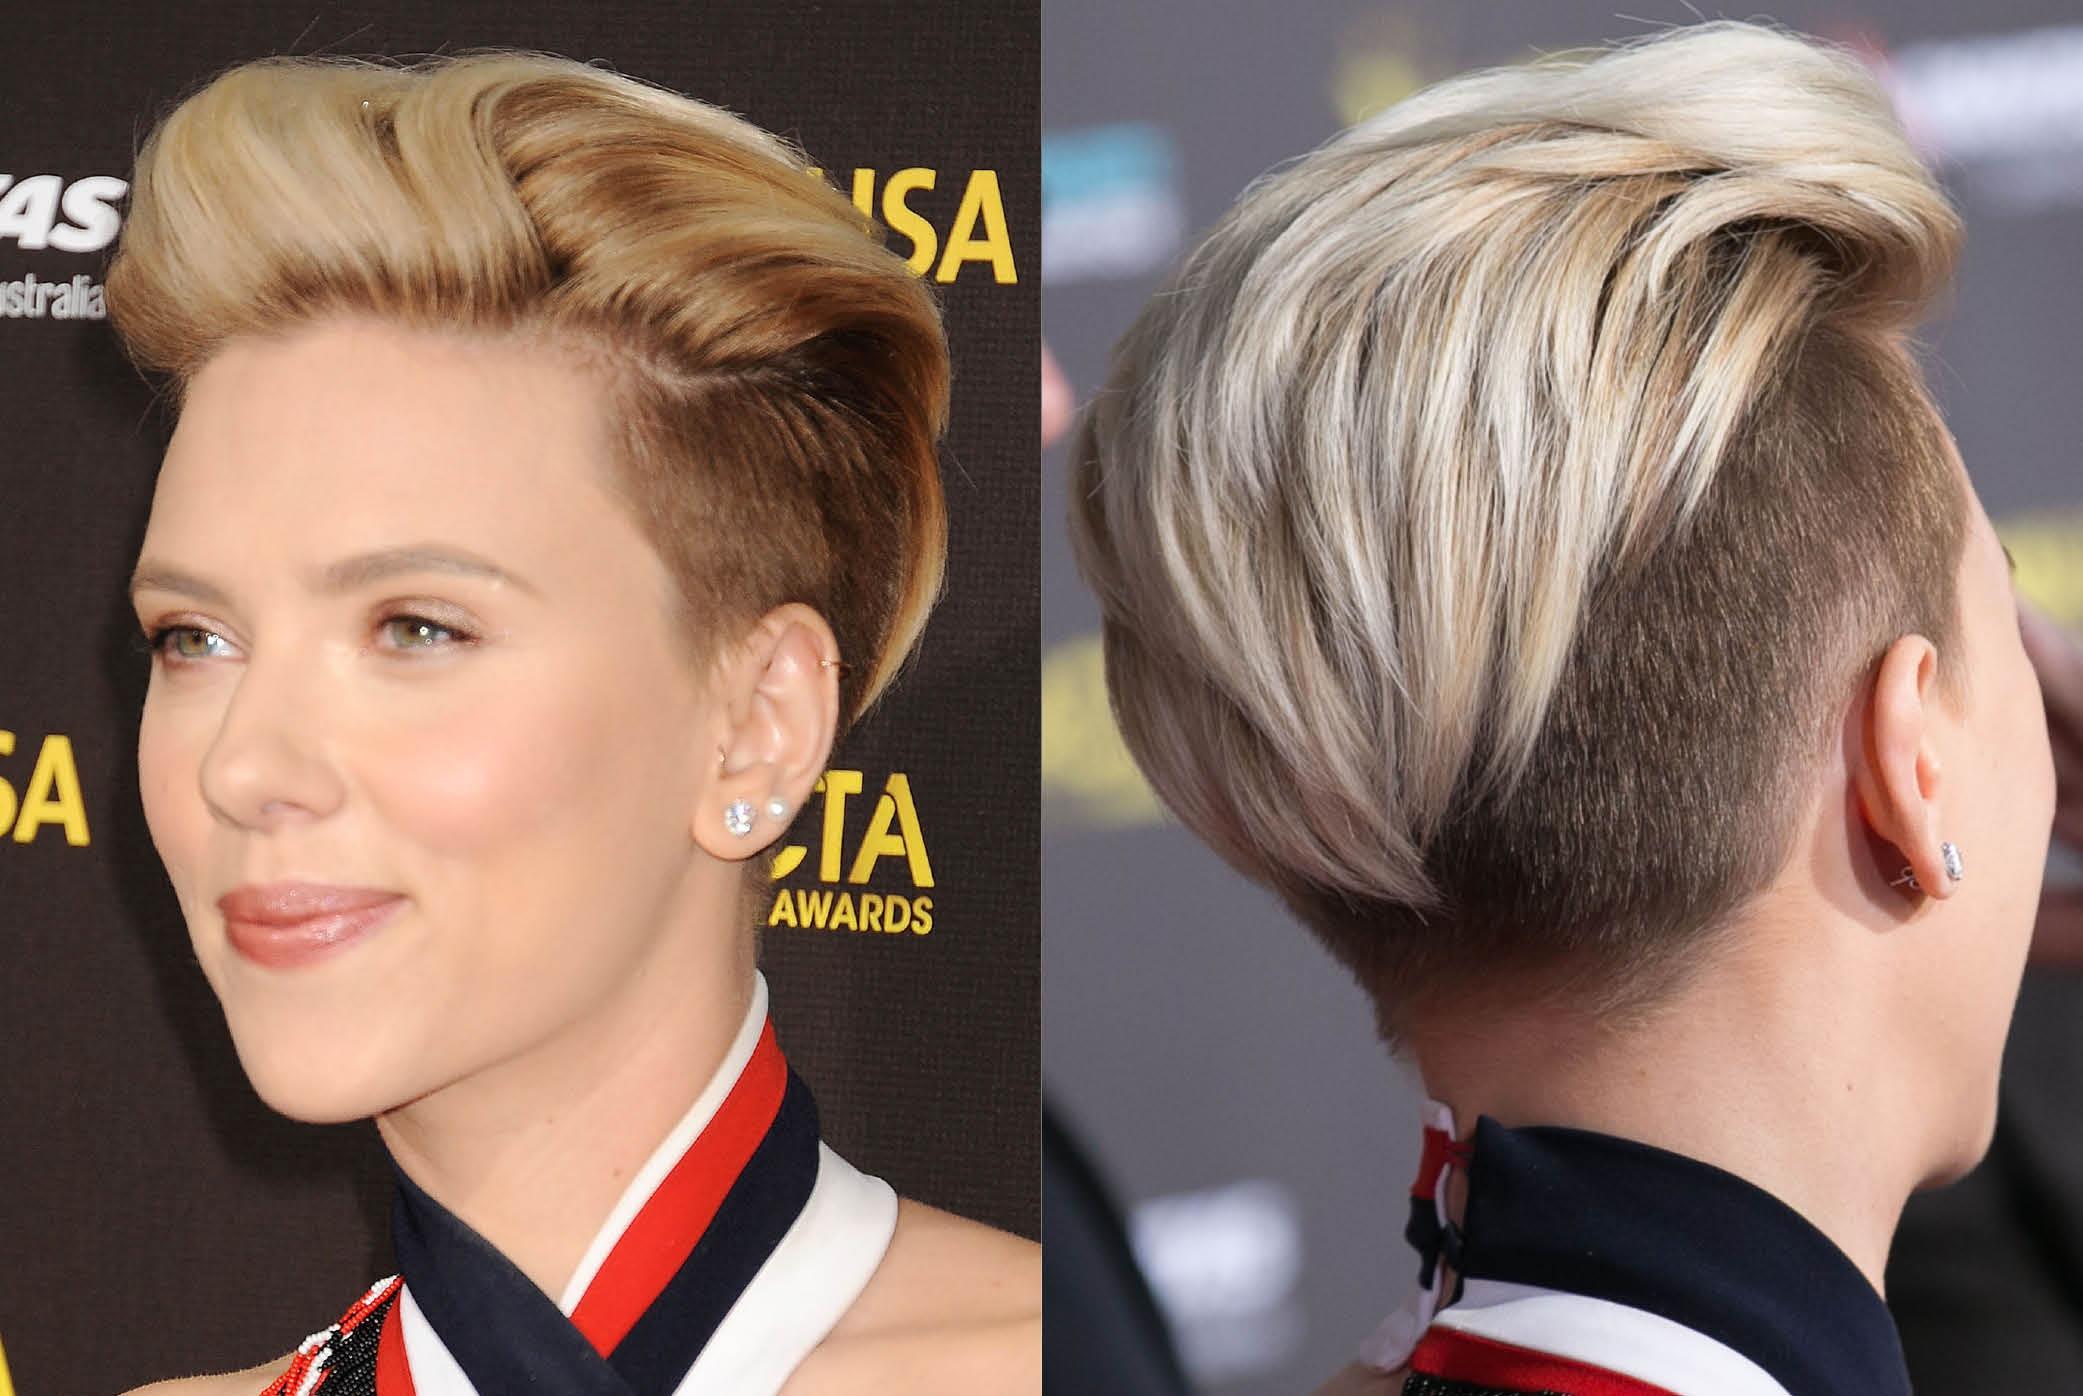 Inspirasi Rambut Baru - Gaya rambut pendek demi lovato